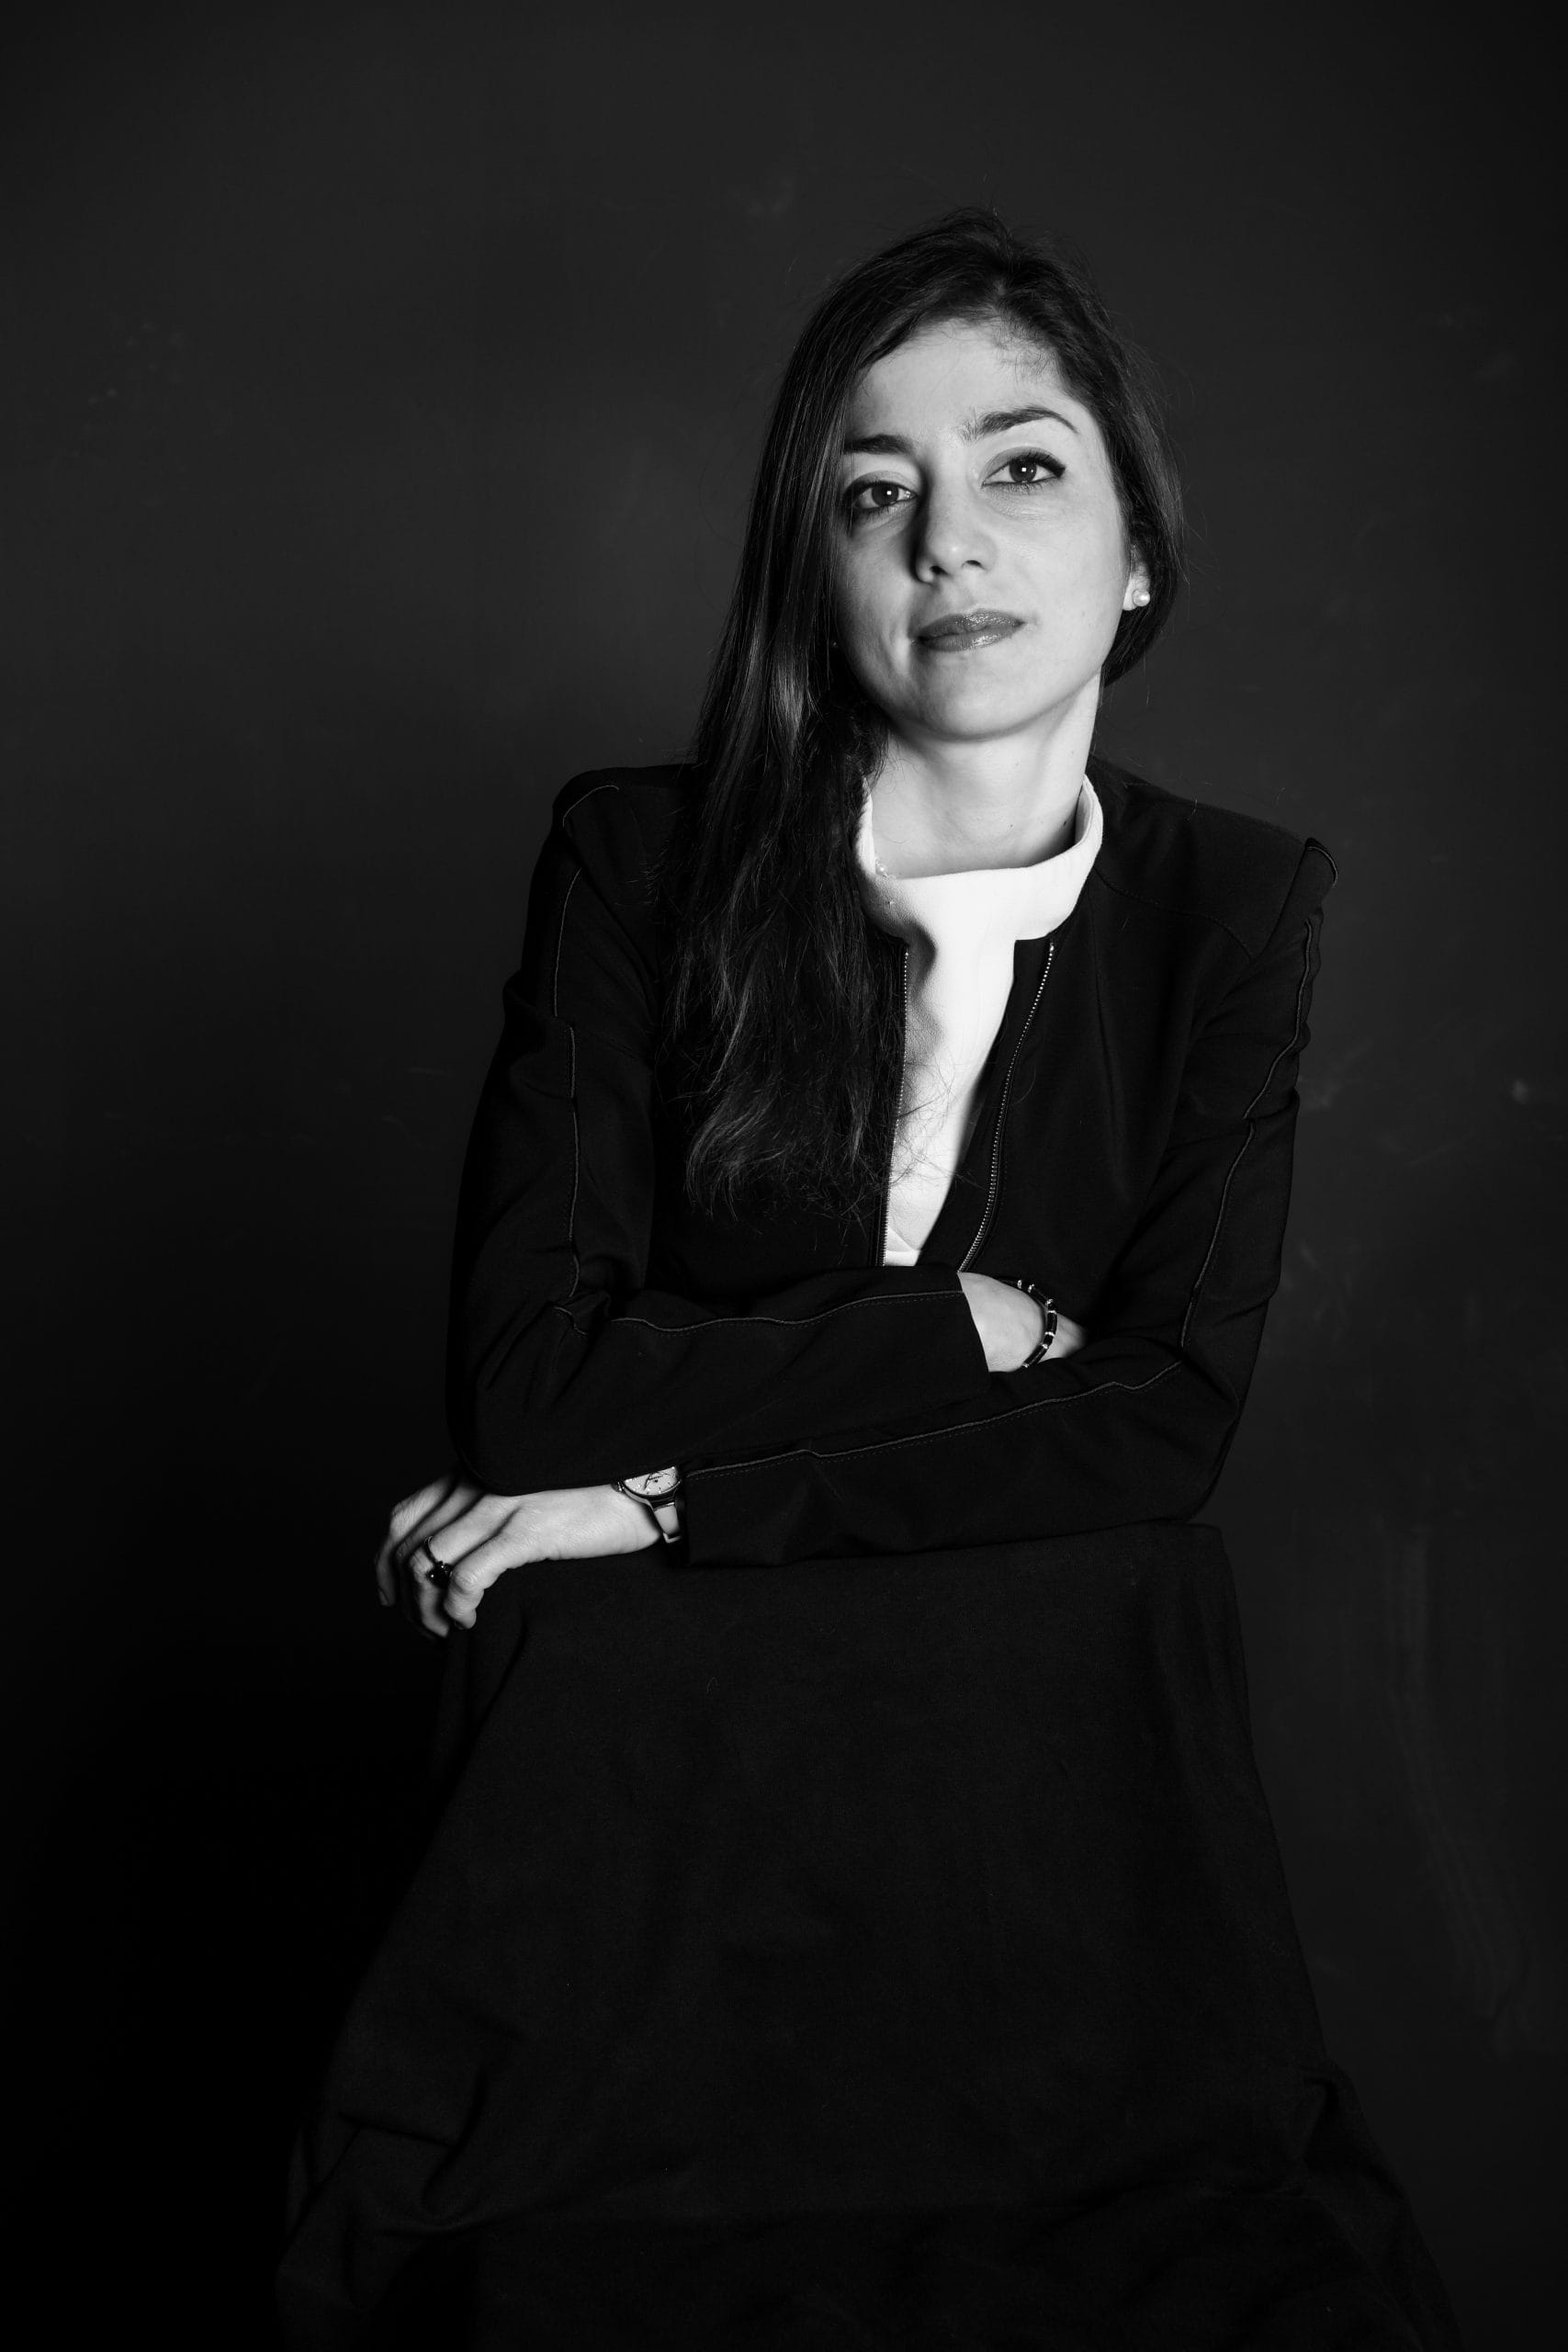 Paola Quadri